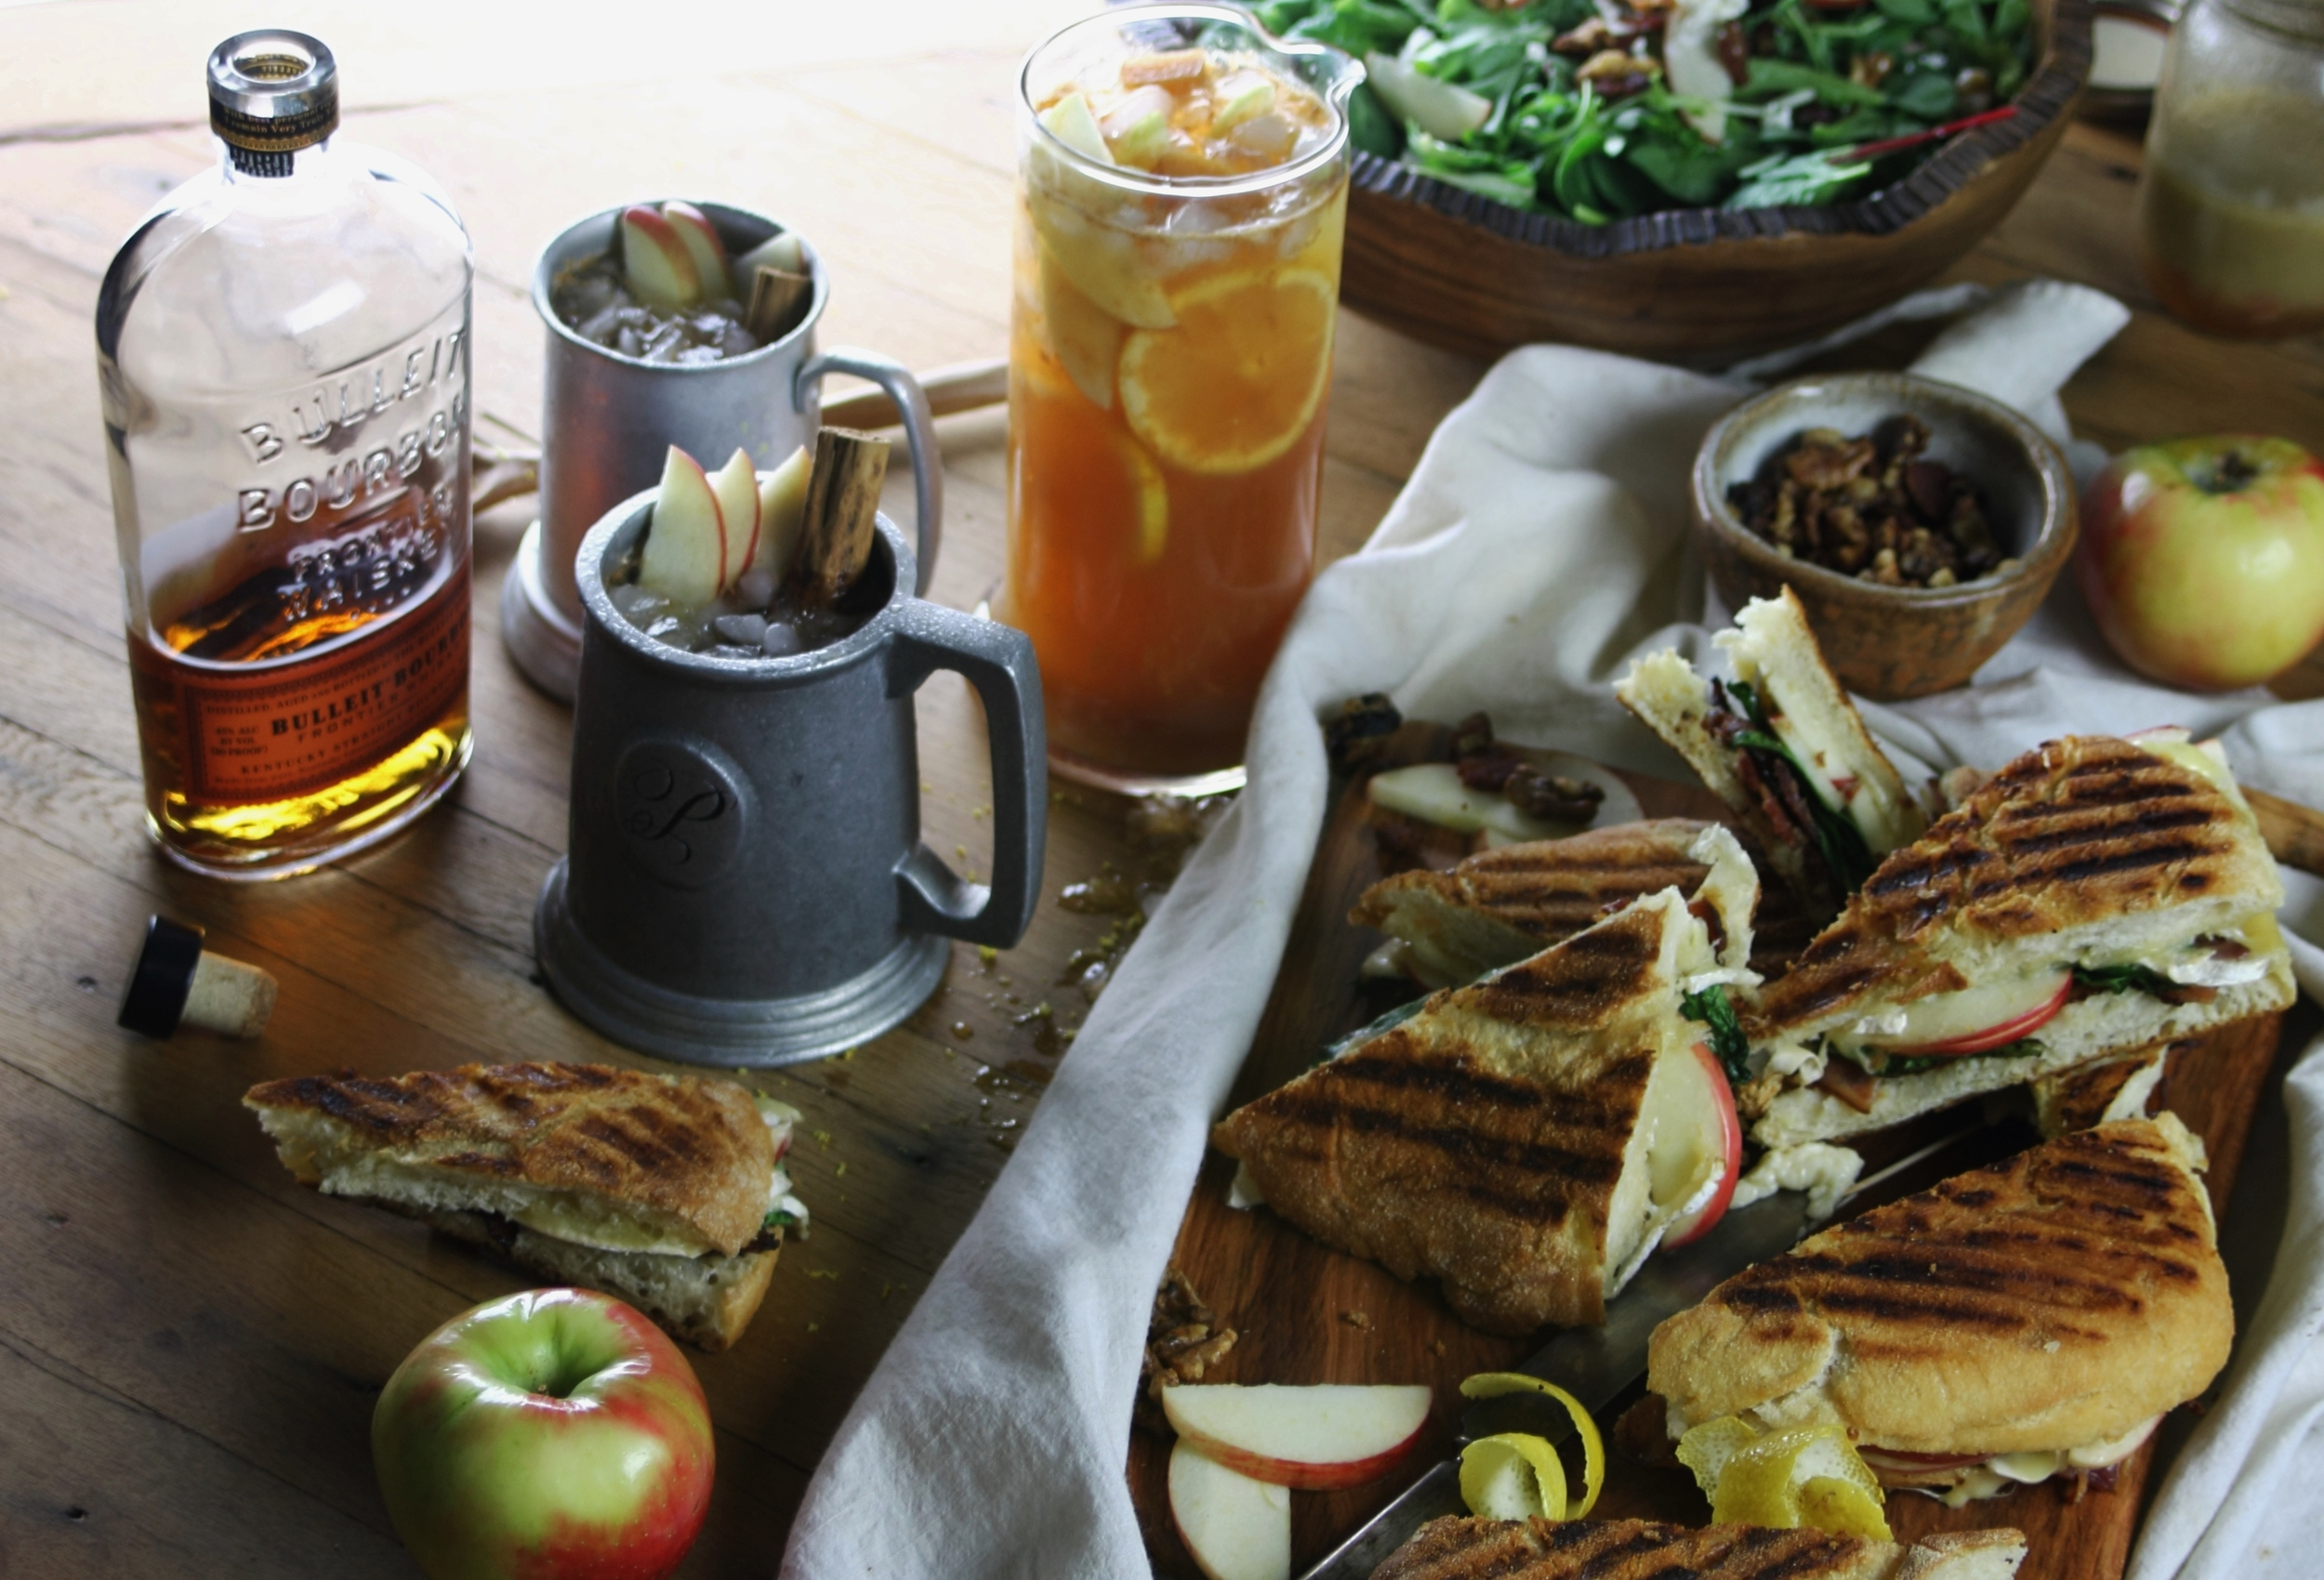 A Bourbon Dinner: My Diary of Us